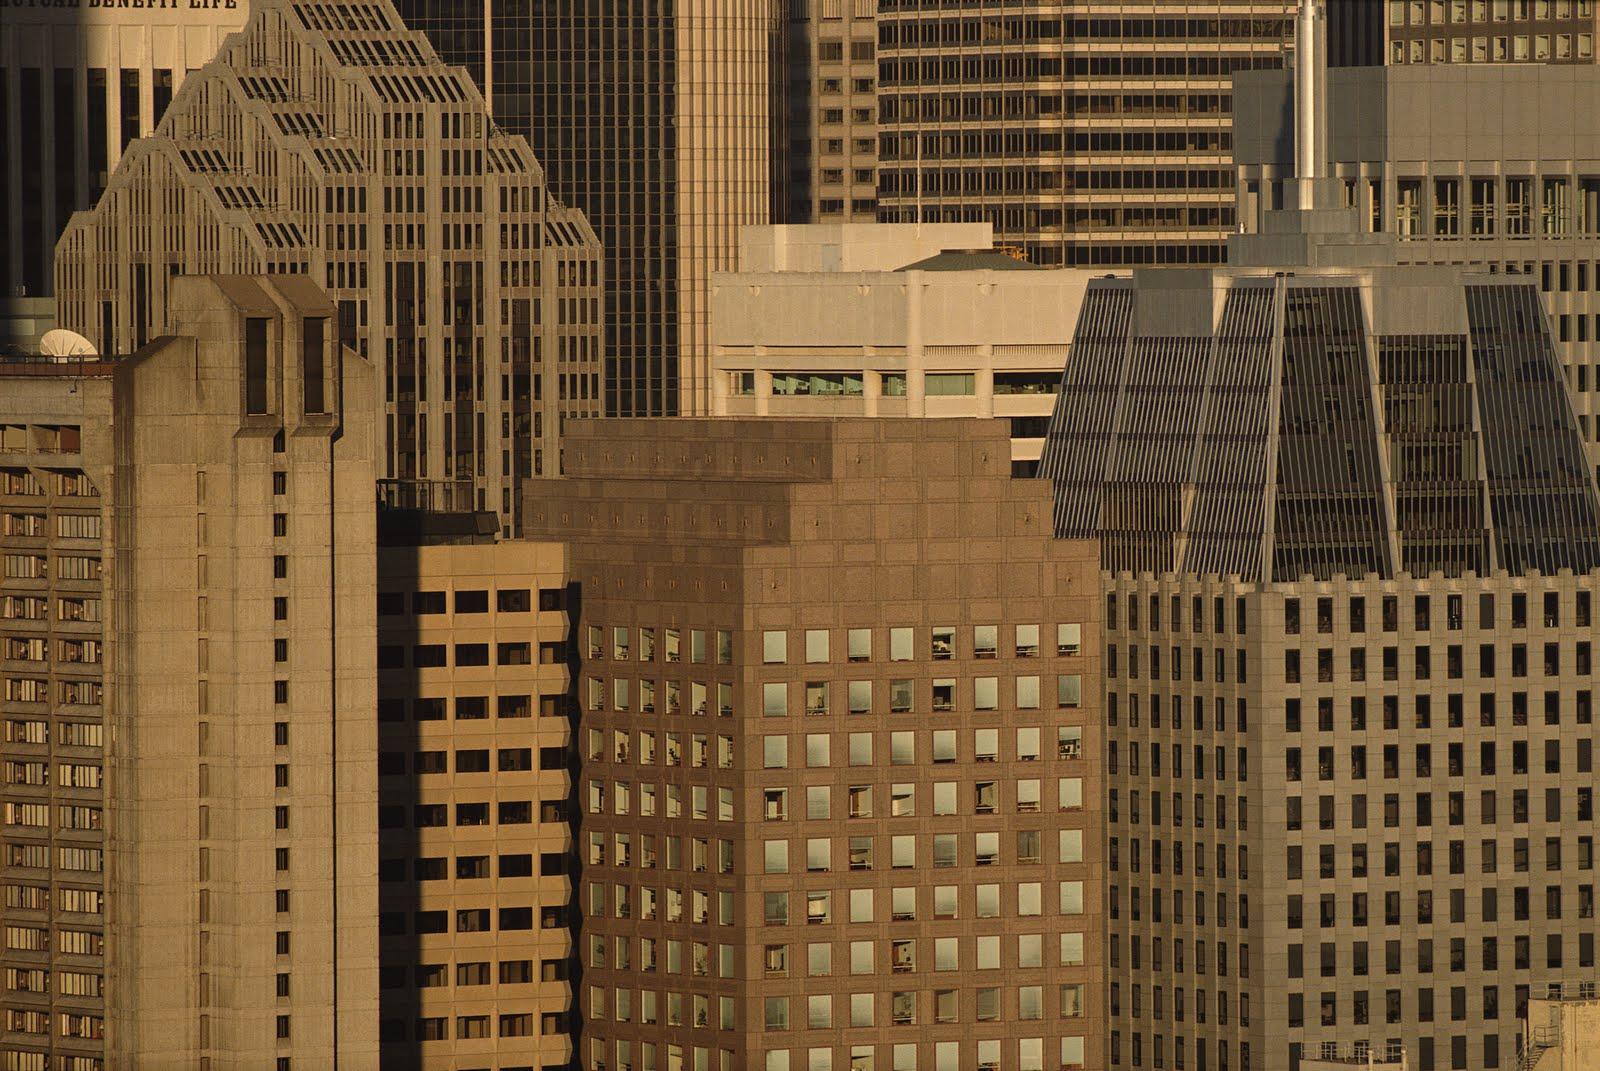 download wallpaper wallpaper gedung pencakar langit